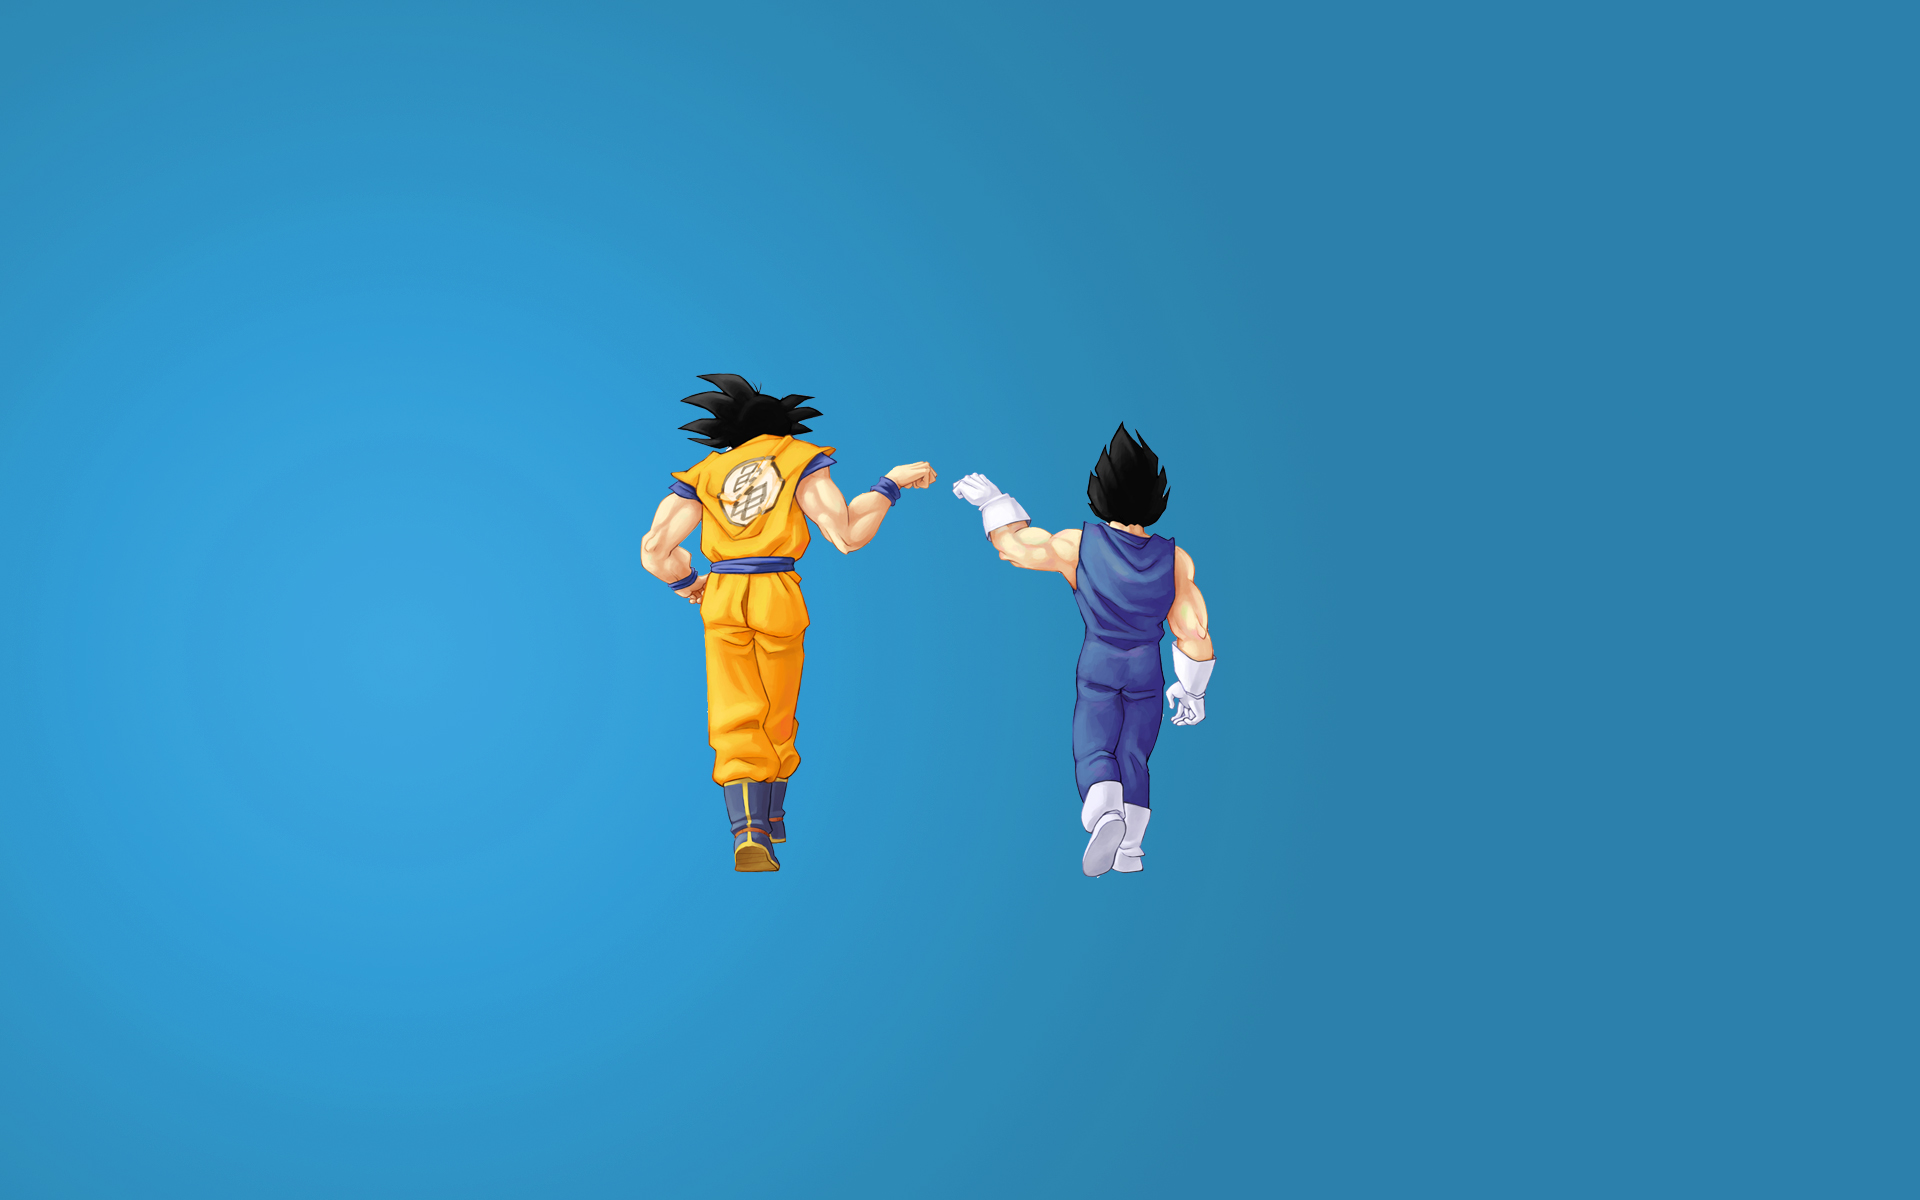 Vegeta Goku Wallpaper 1920x1200 Vegeta Goku Dragon Ball Z 1920x1200